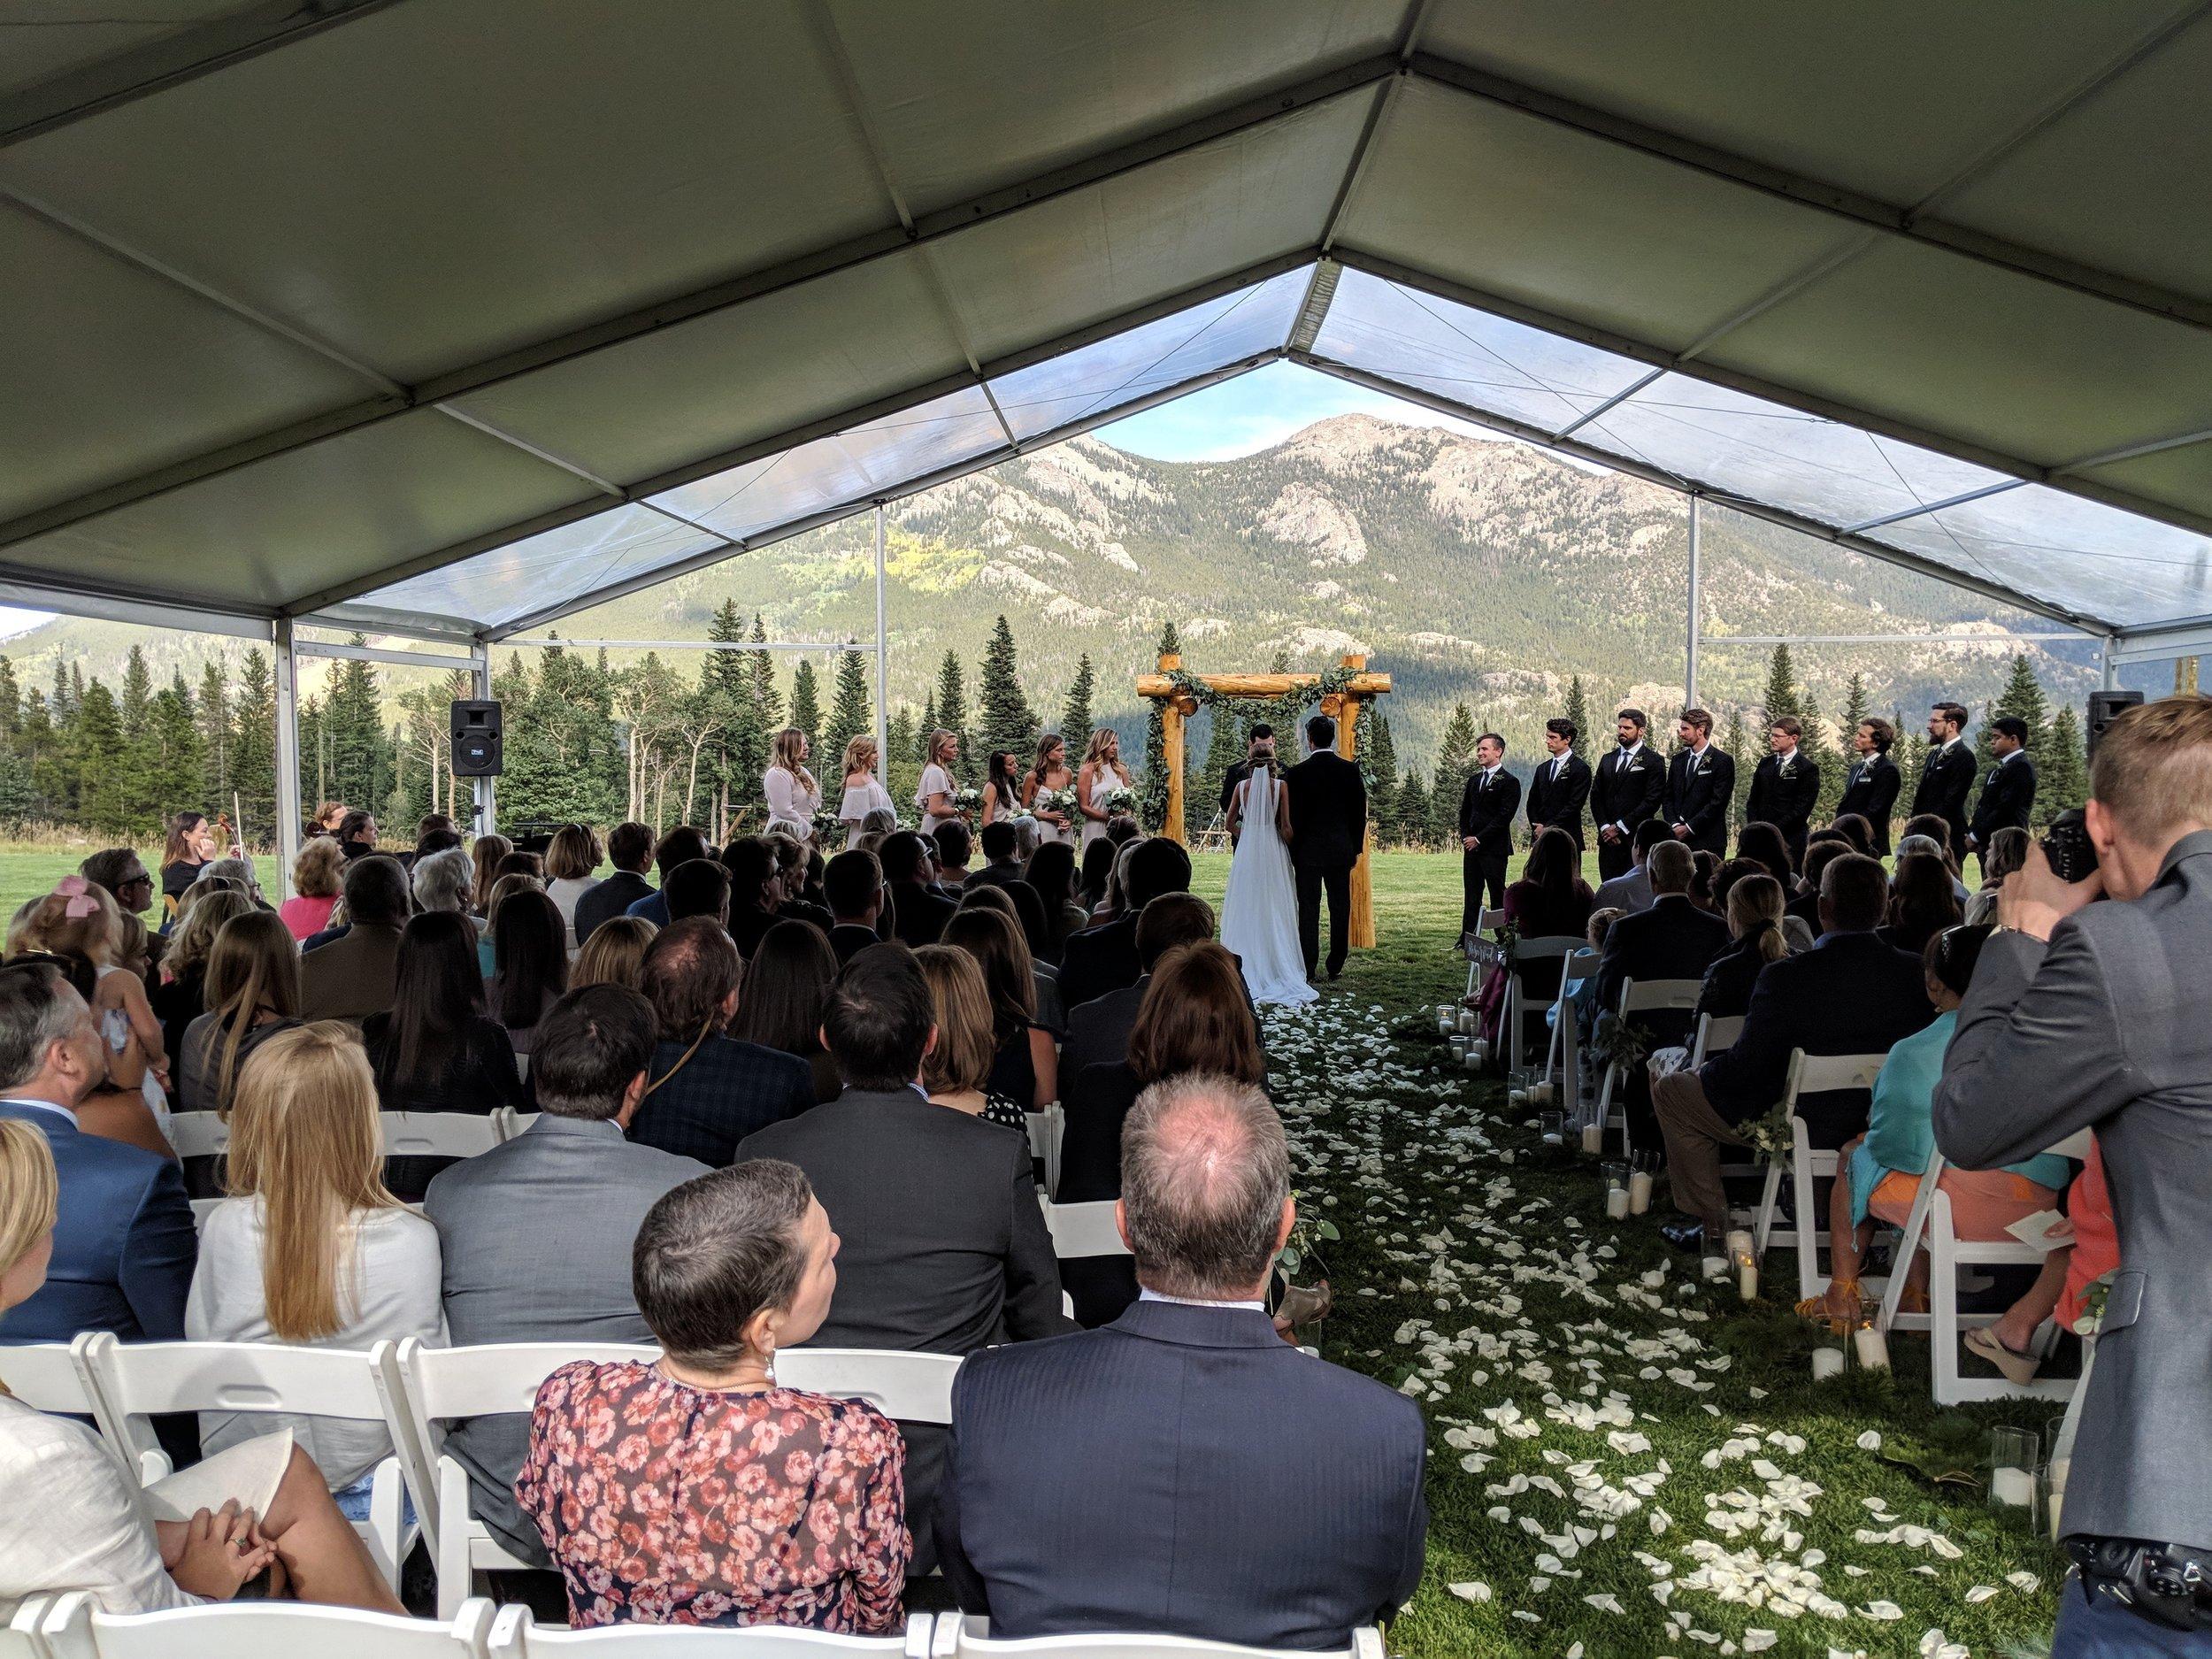 Flute quartet wedding ceremony music in estes park, Colorado